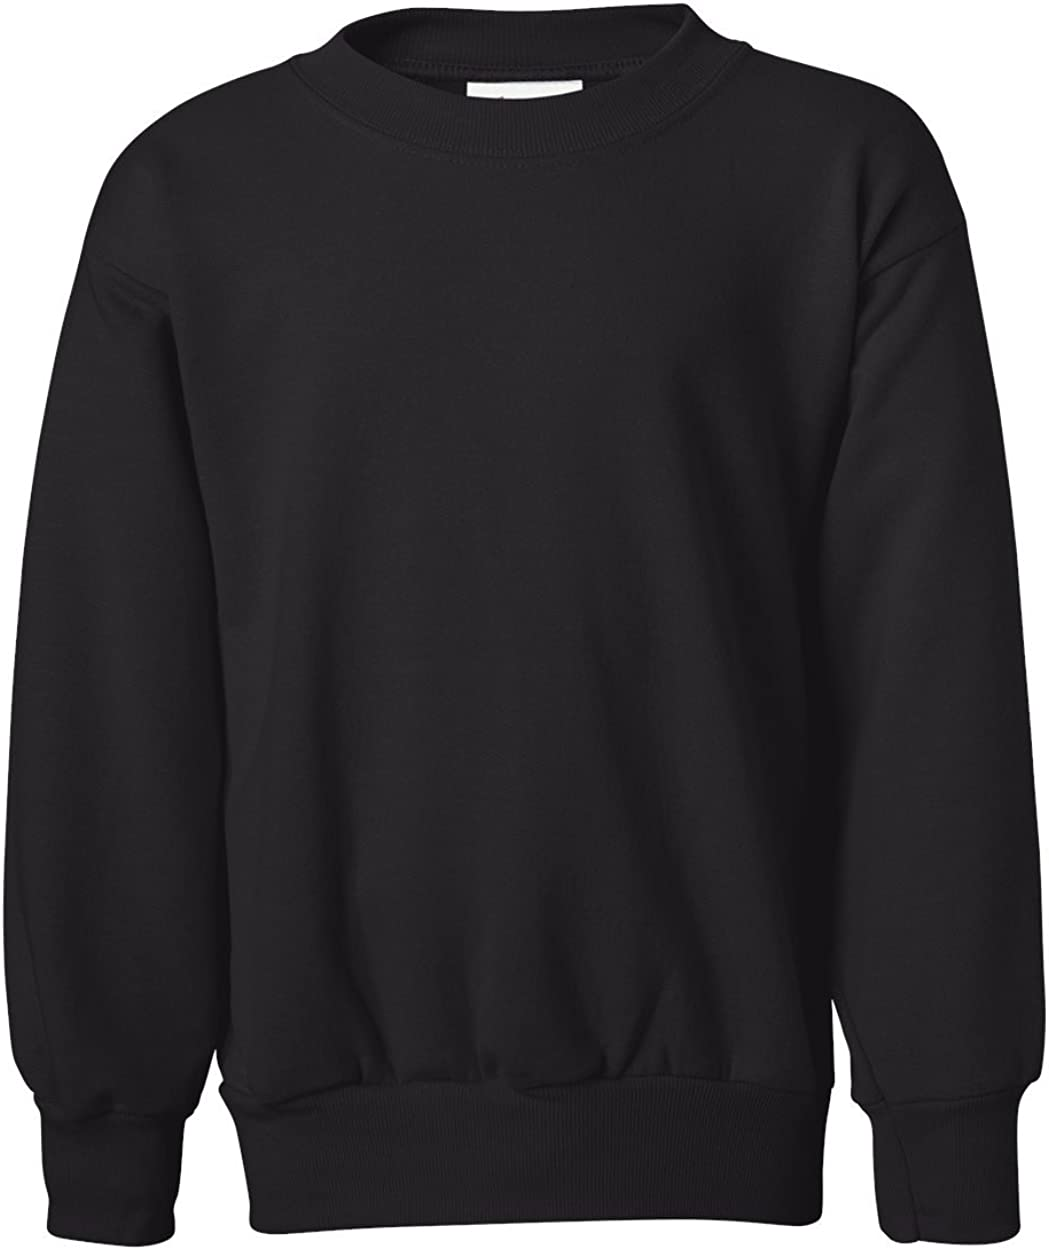 Hanes Boys ComfortBlend EcoSmart Crewneck Sweatshirt: Clothing